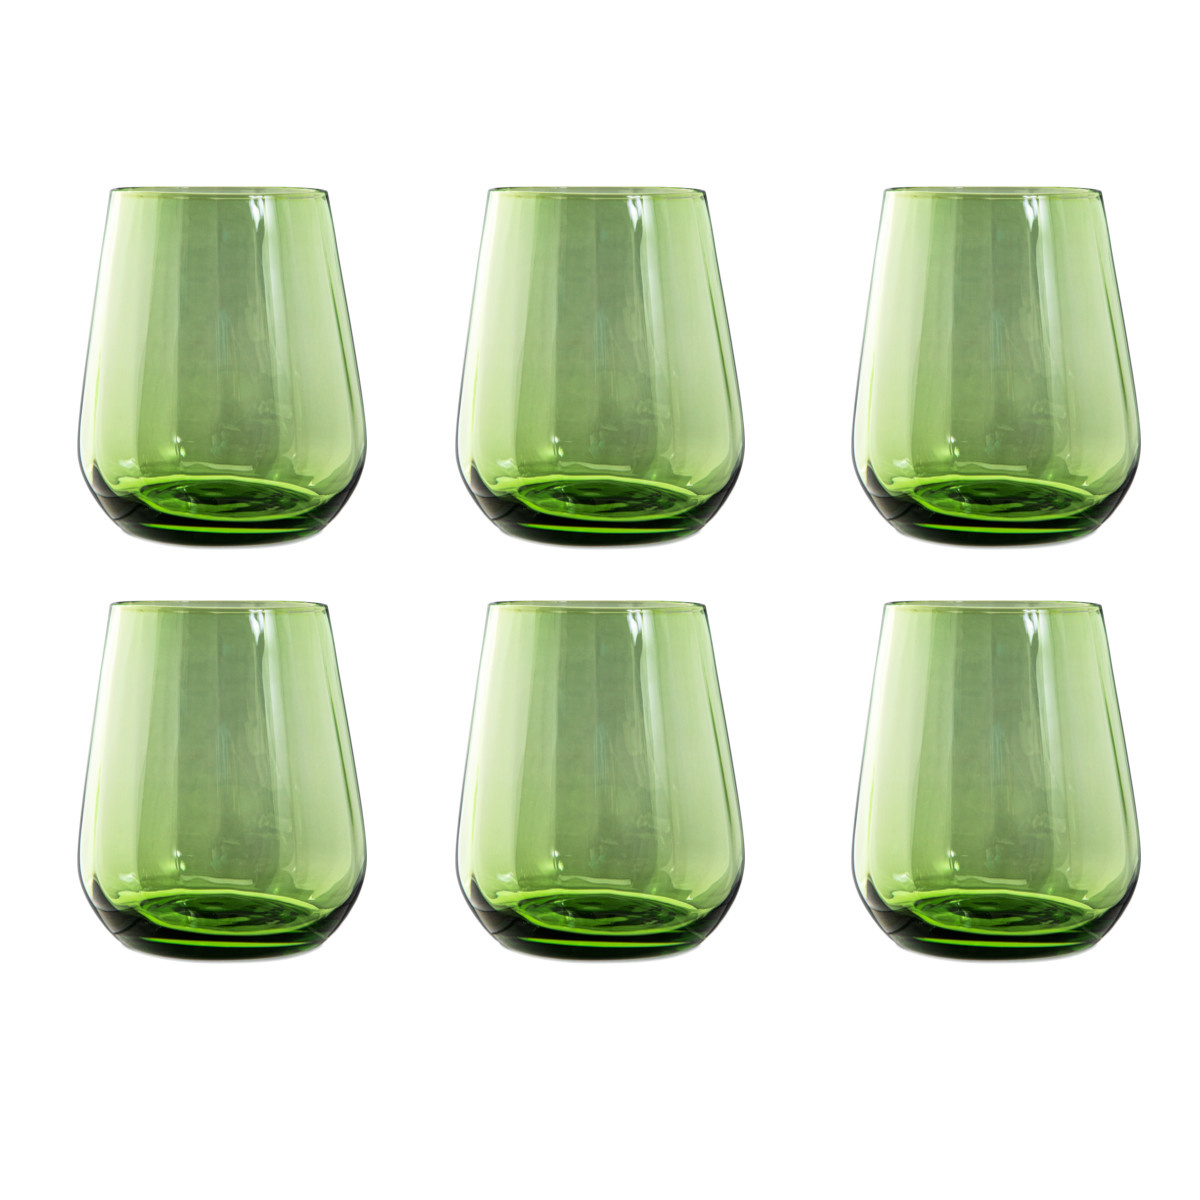 Livellara Livellara RINASCIMENTO  Verre Tumbler 400 ml – Lot de 6 – Vert